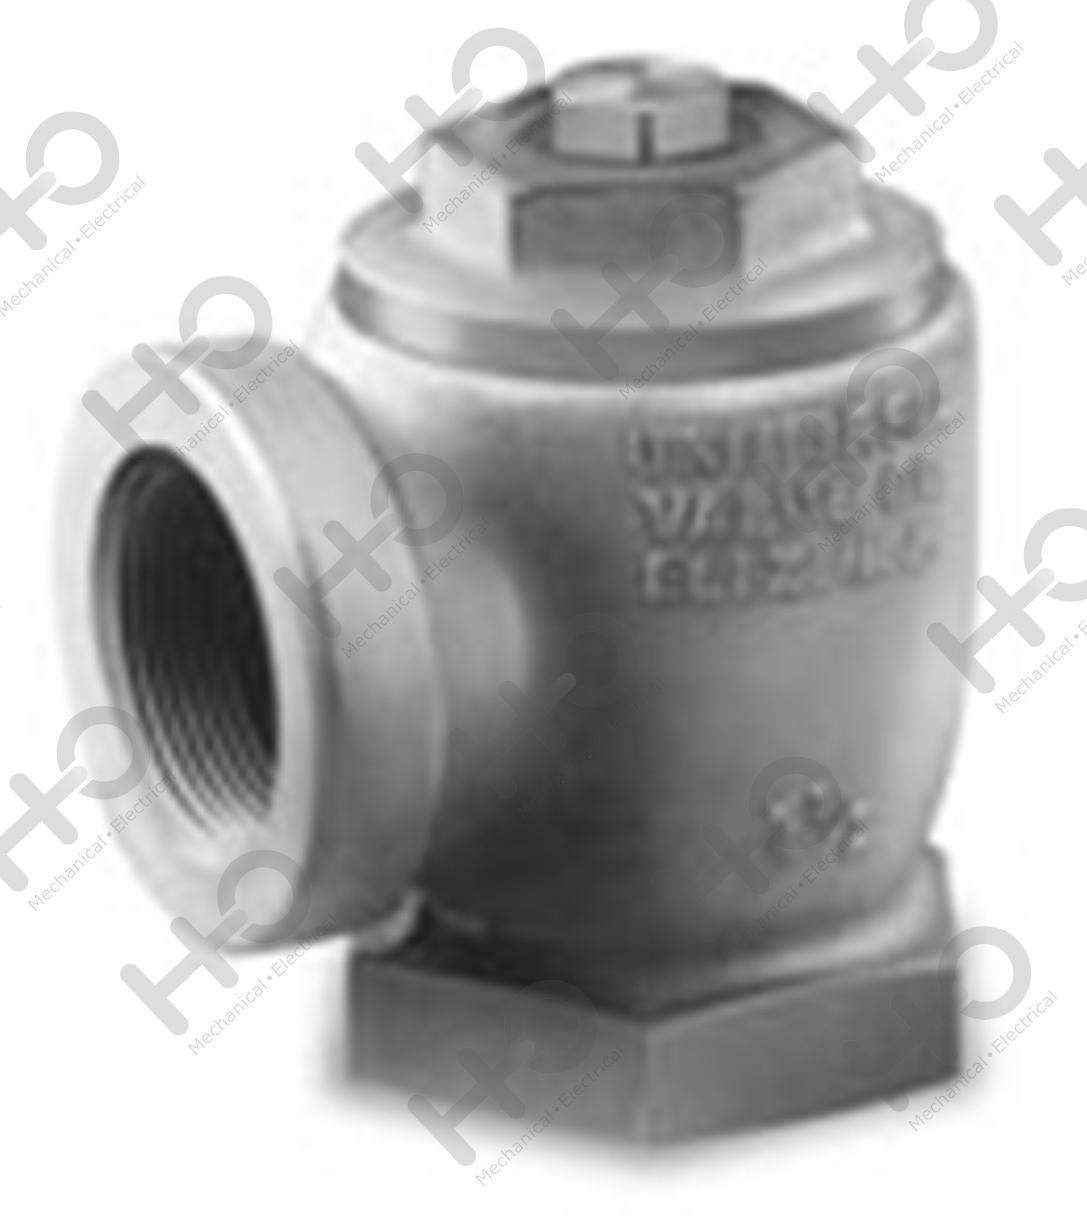 VALCO电动阀, VALCOM压力开关VPRQ-A3-5MPaS-5  1